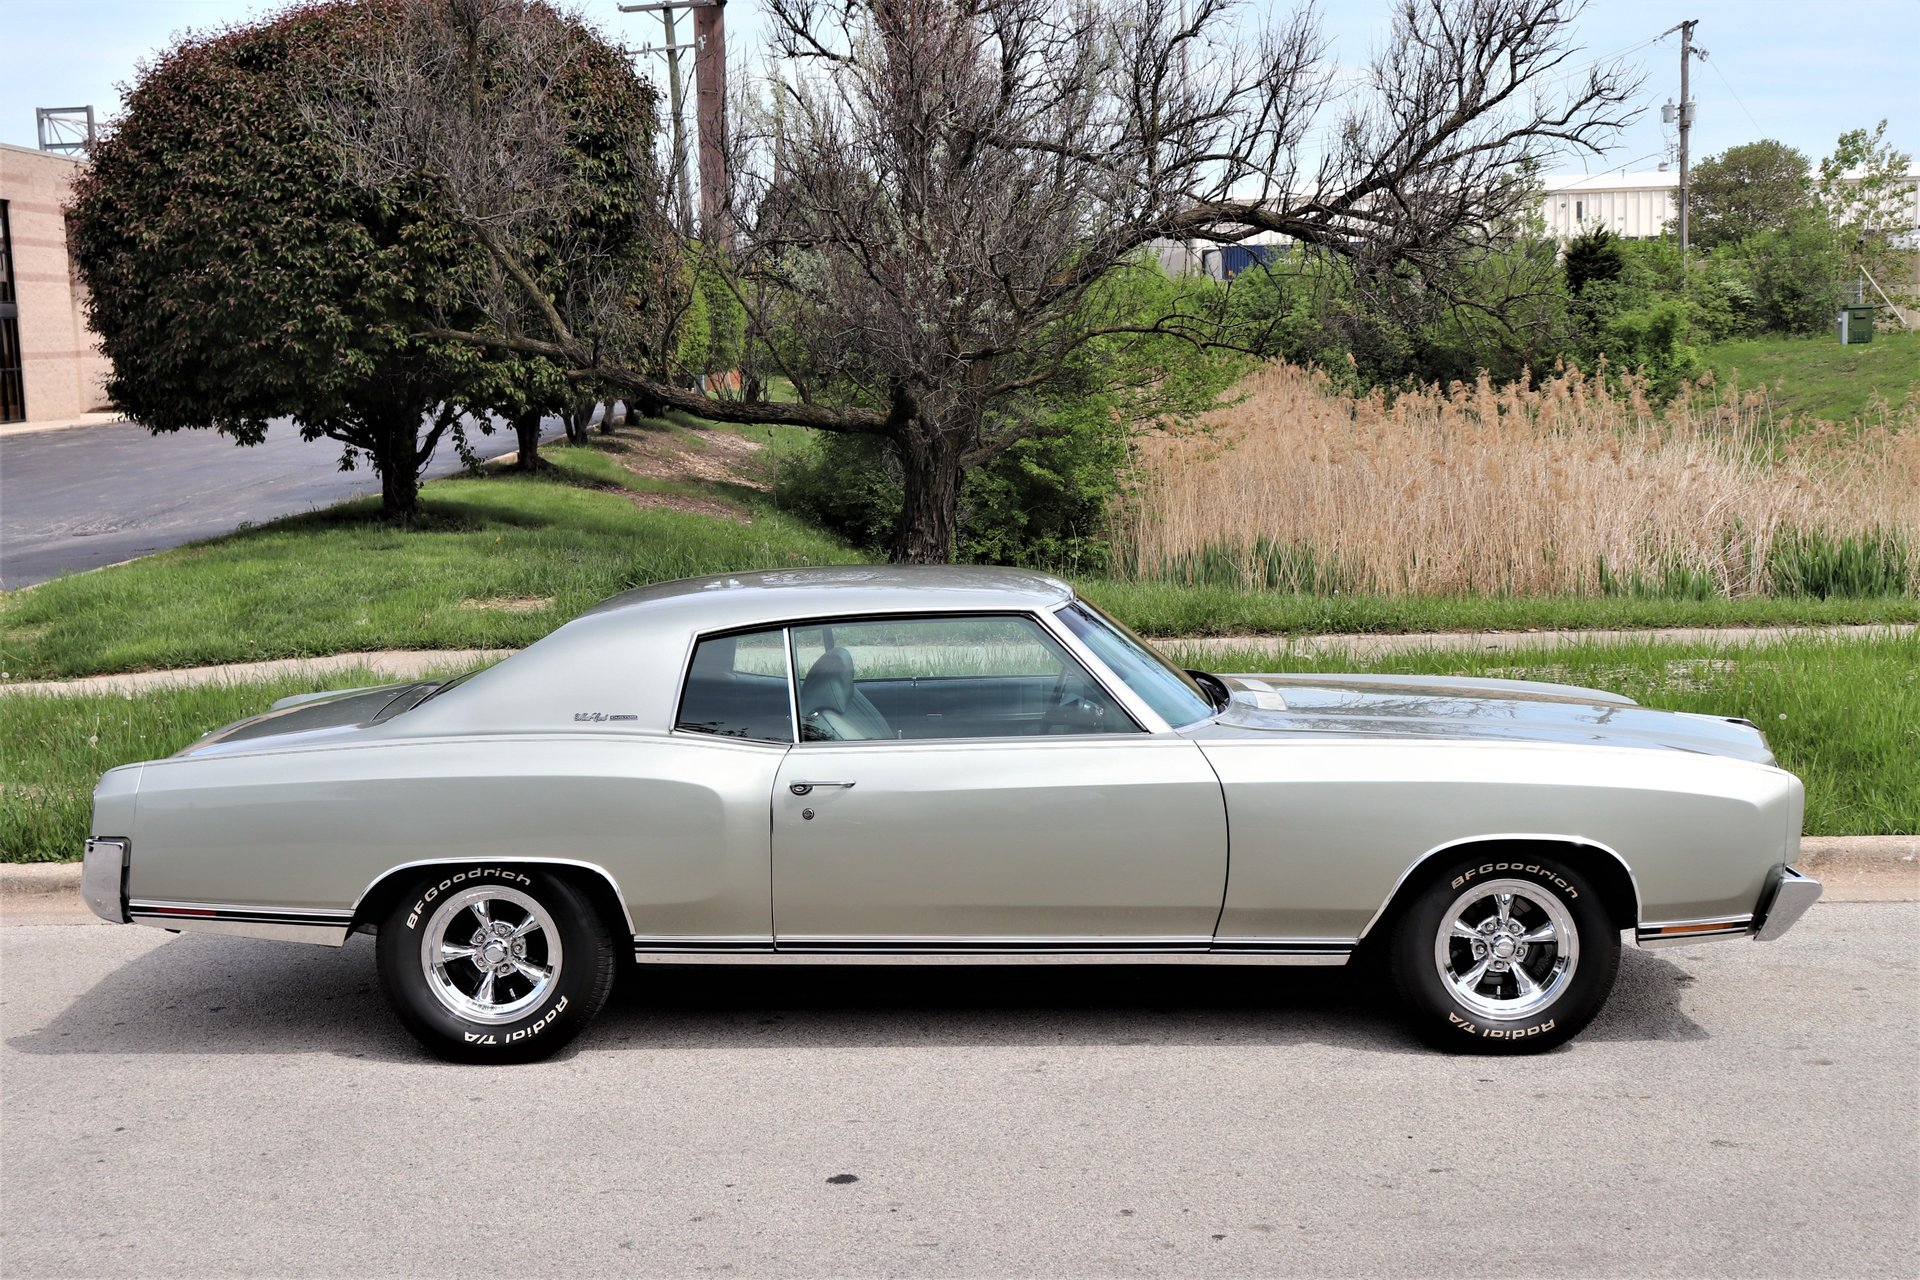 52405e9dd2a6b hd 1972 chevrolet monte carlo custom